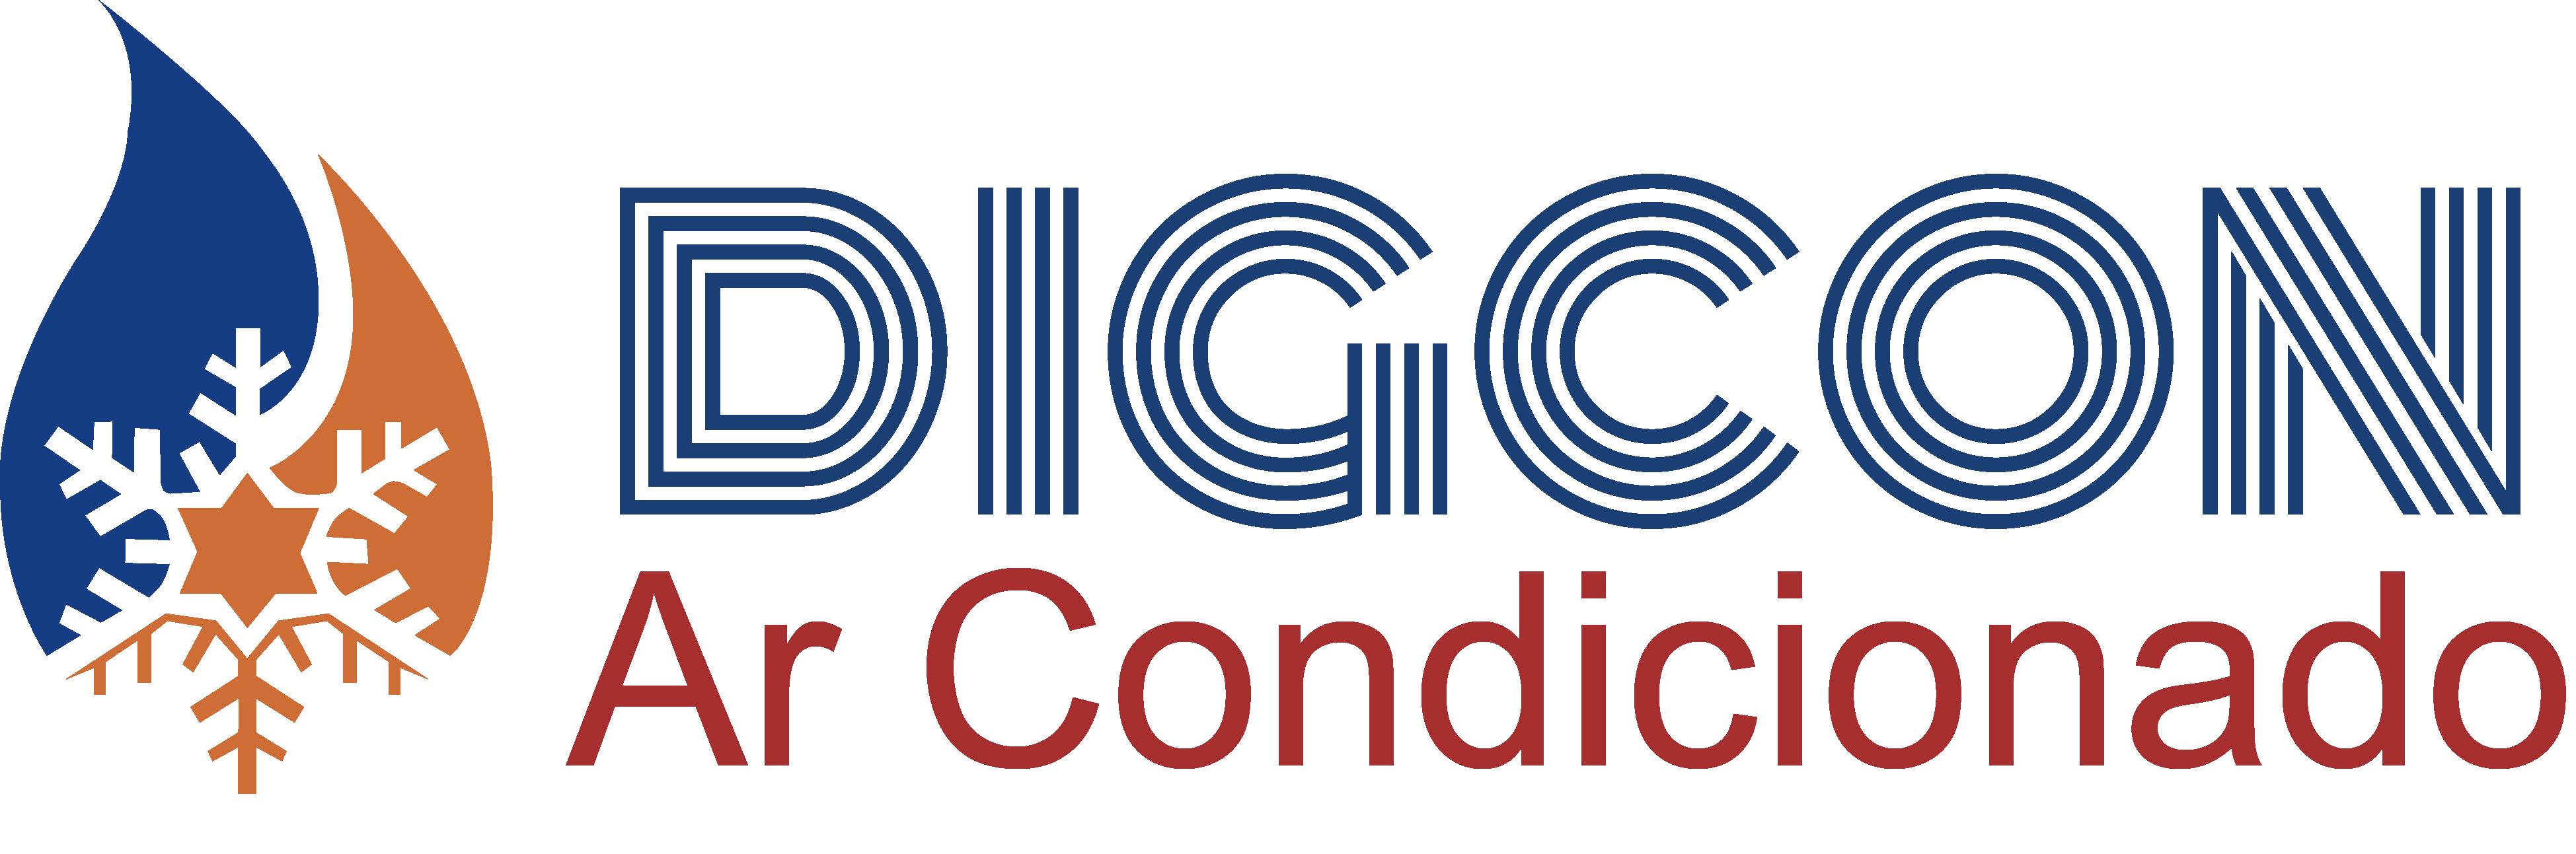 Digcon